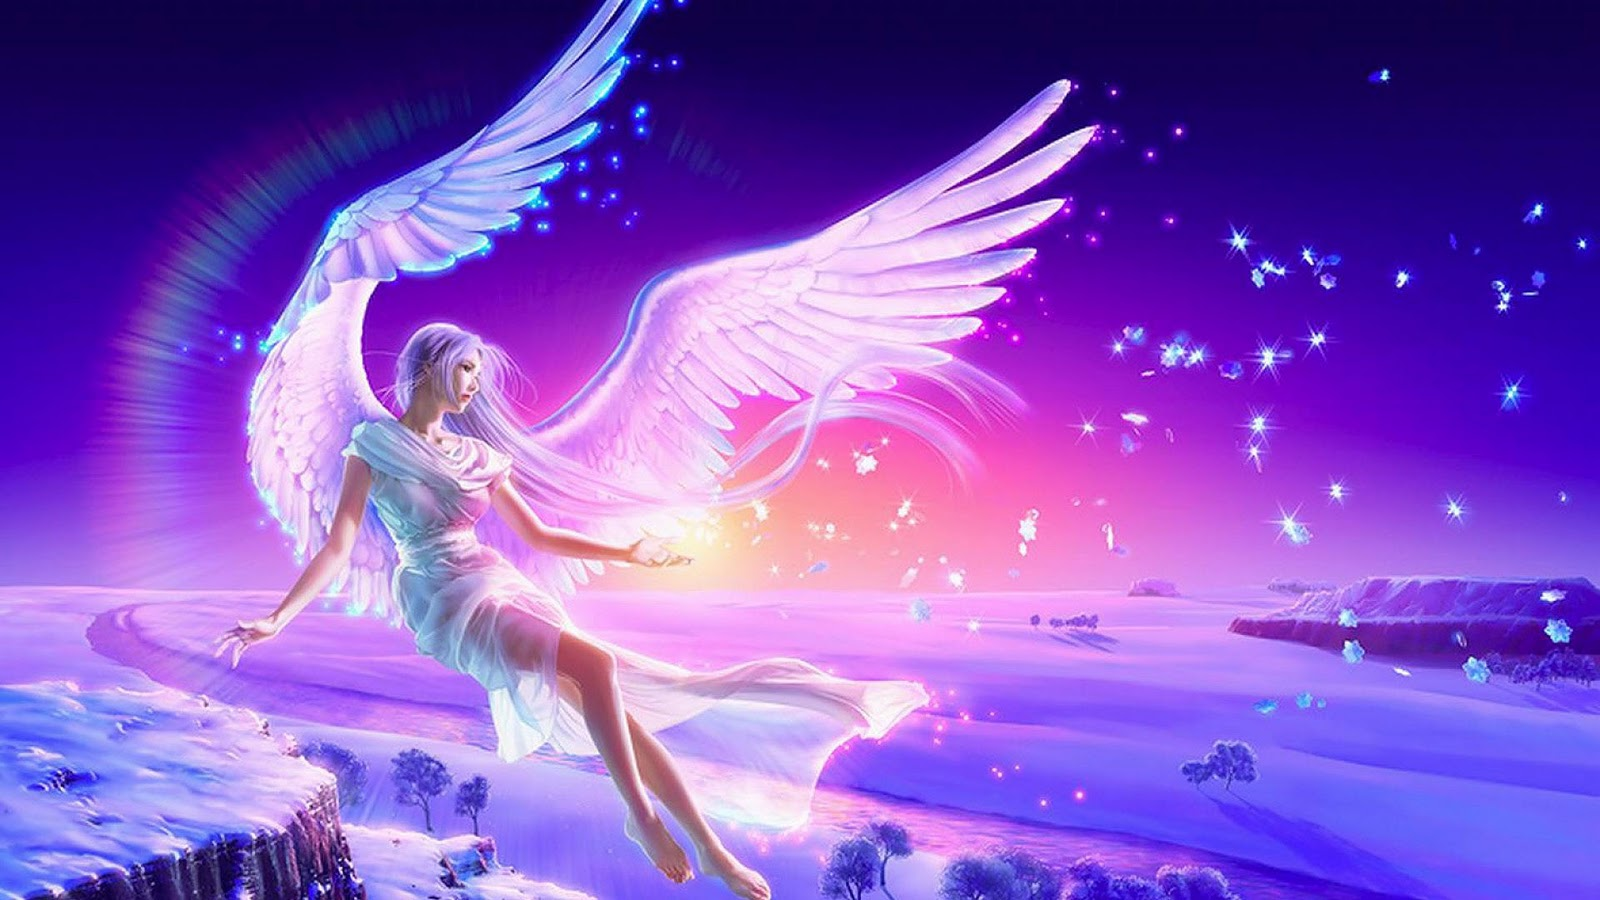 Angels Wallpapers For Desktop 3d: Blue Angels Wallpaper Widescreen